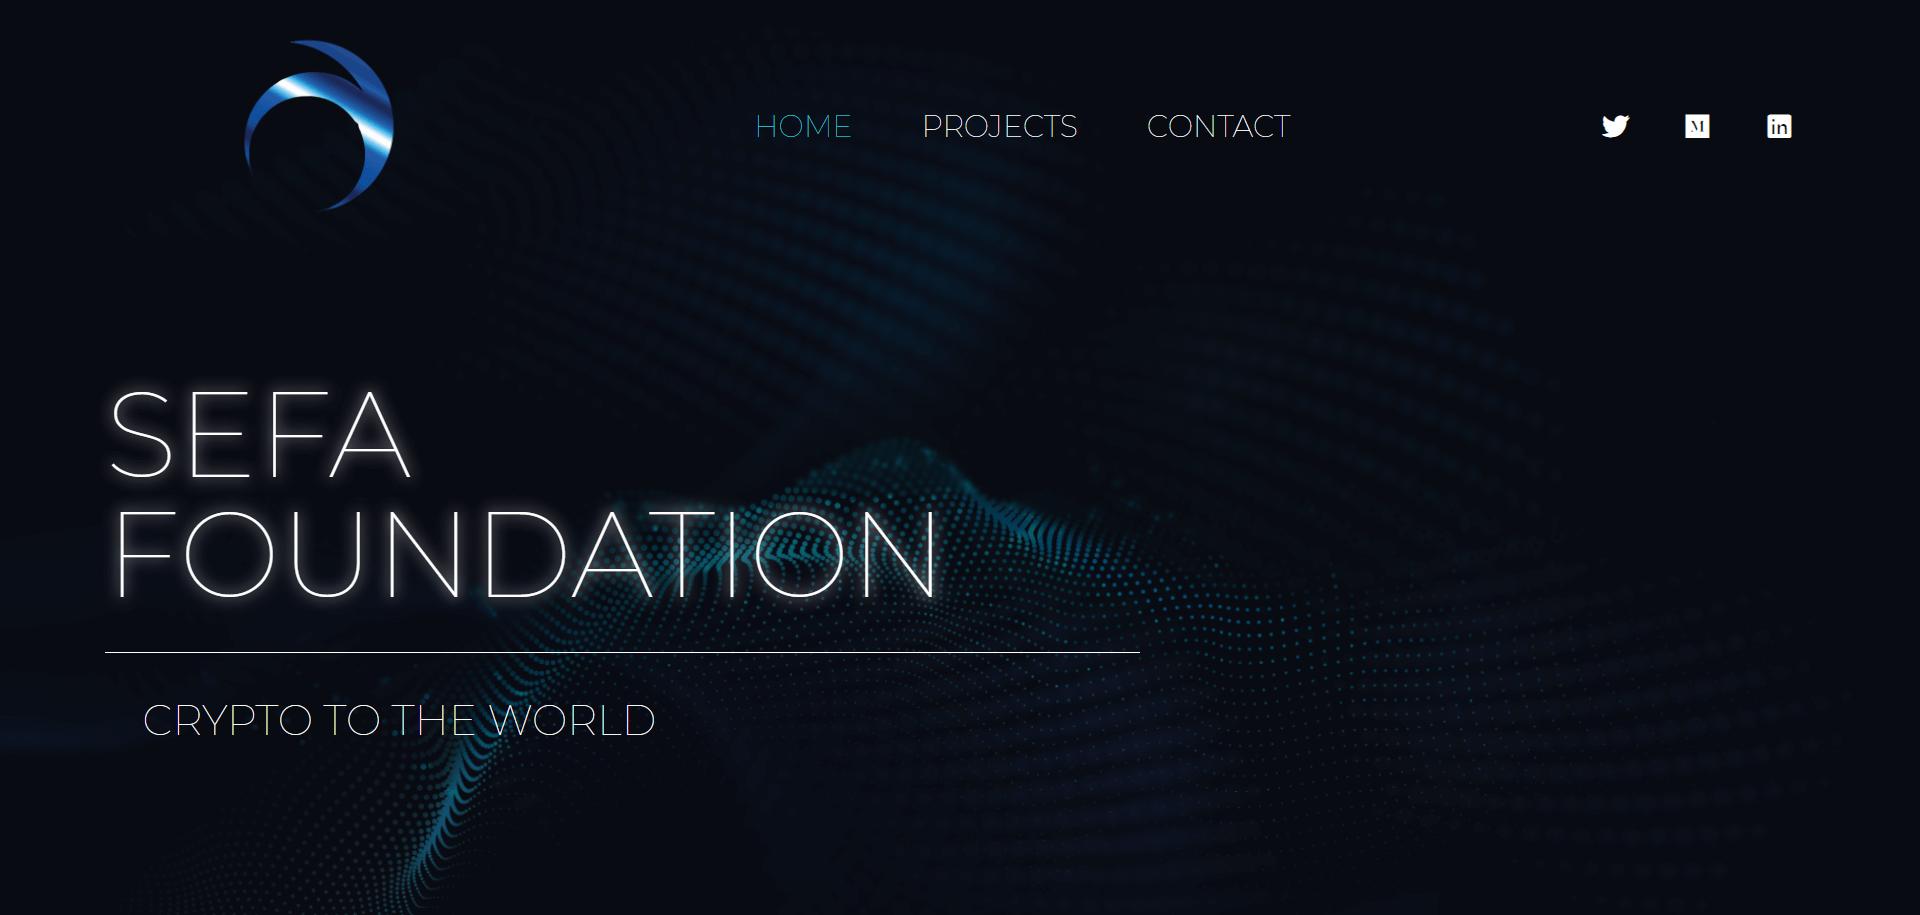 SEFA foundation - https://sefa.foundation